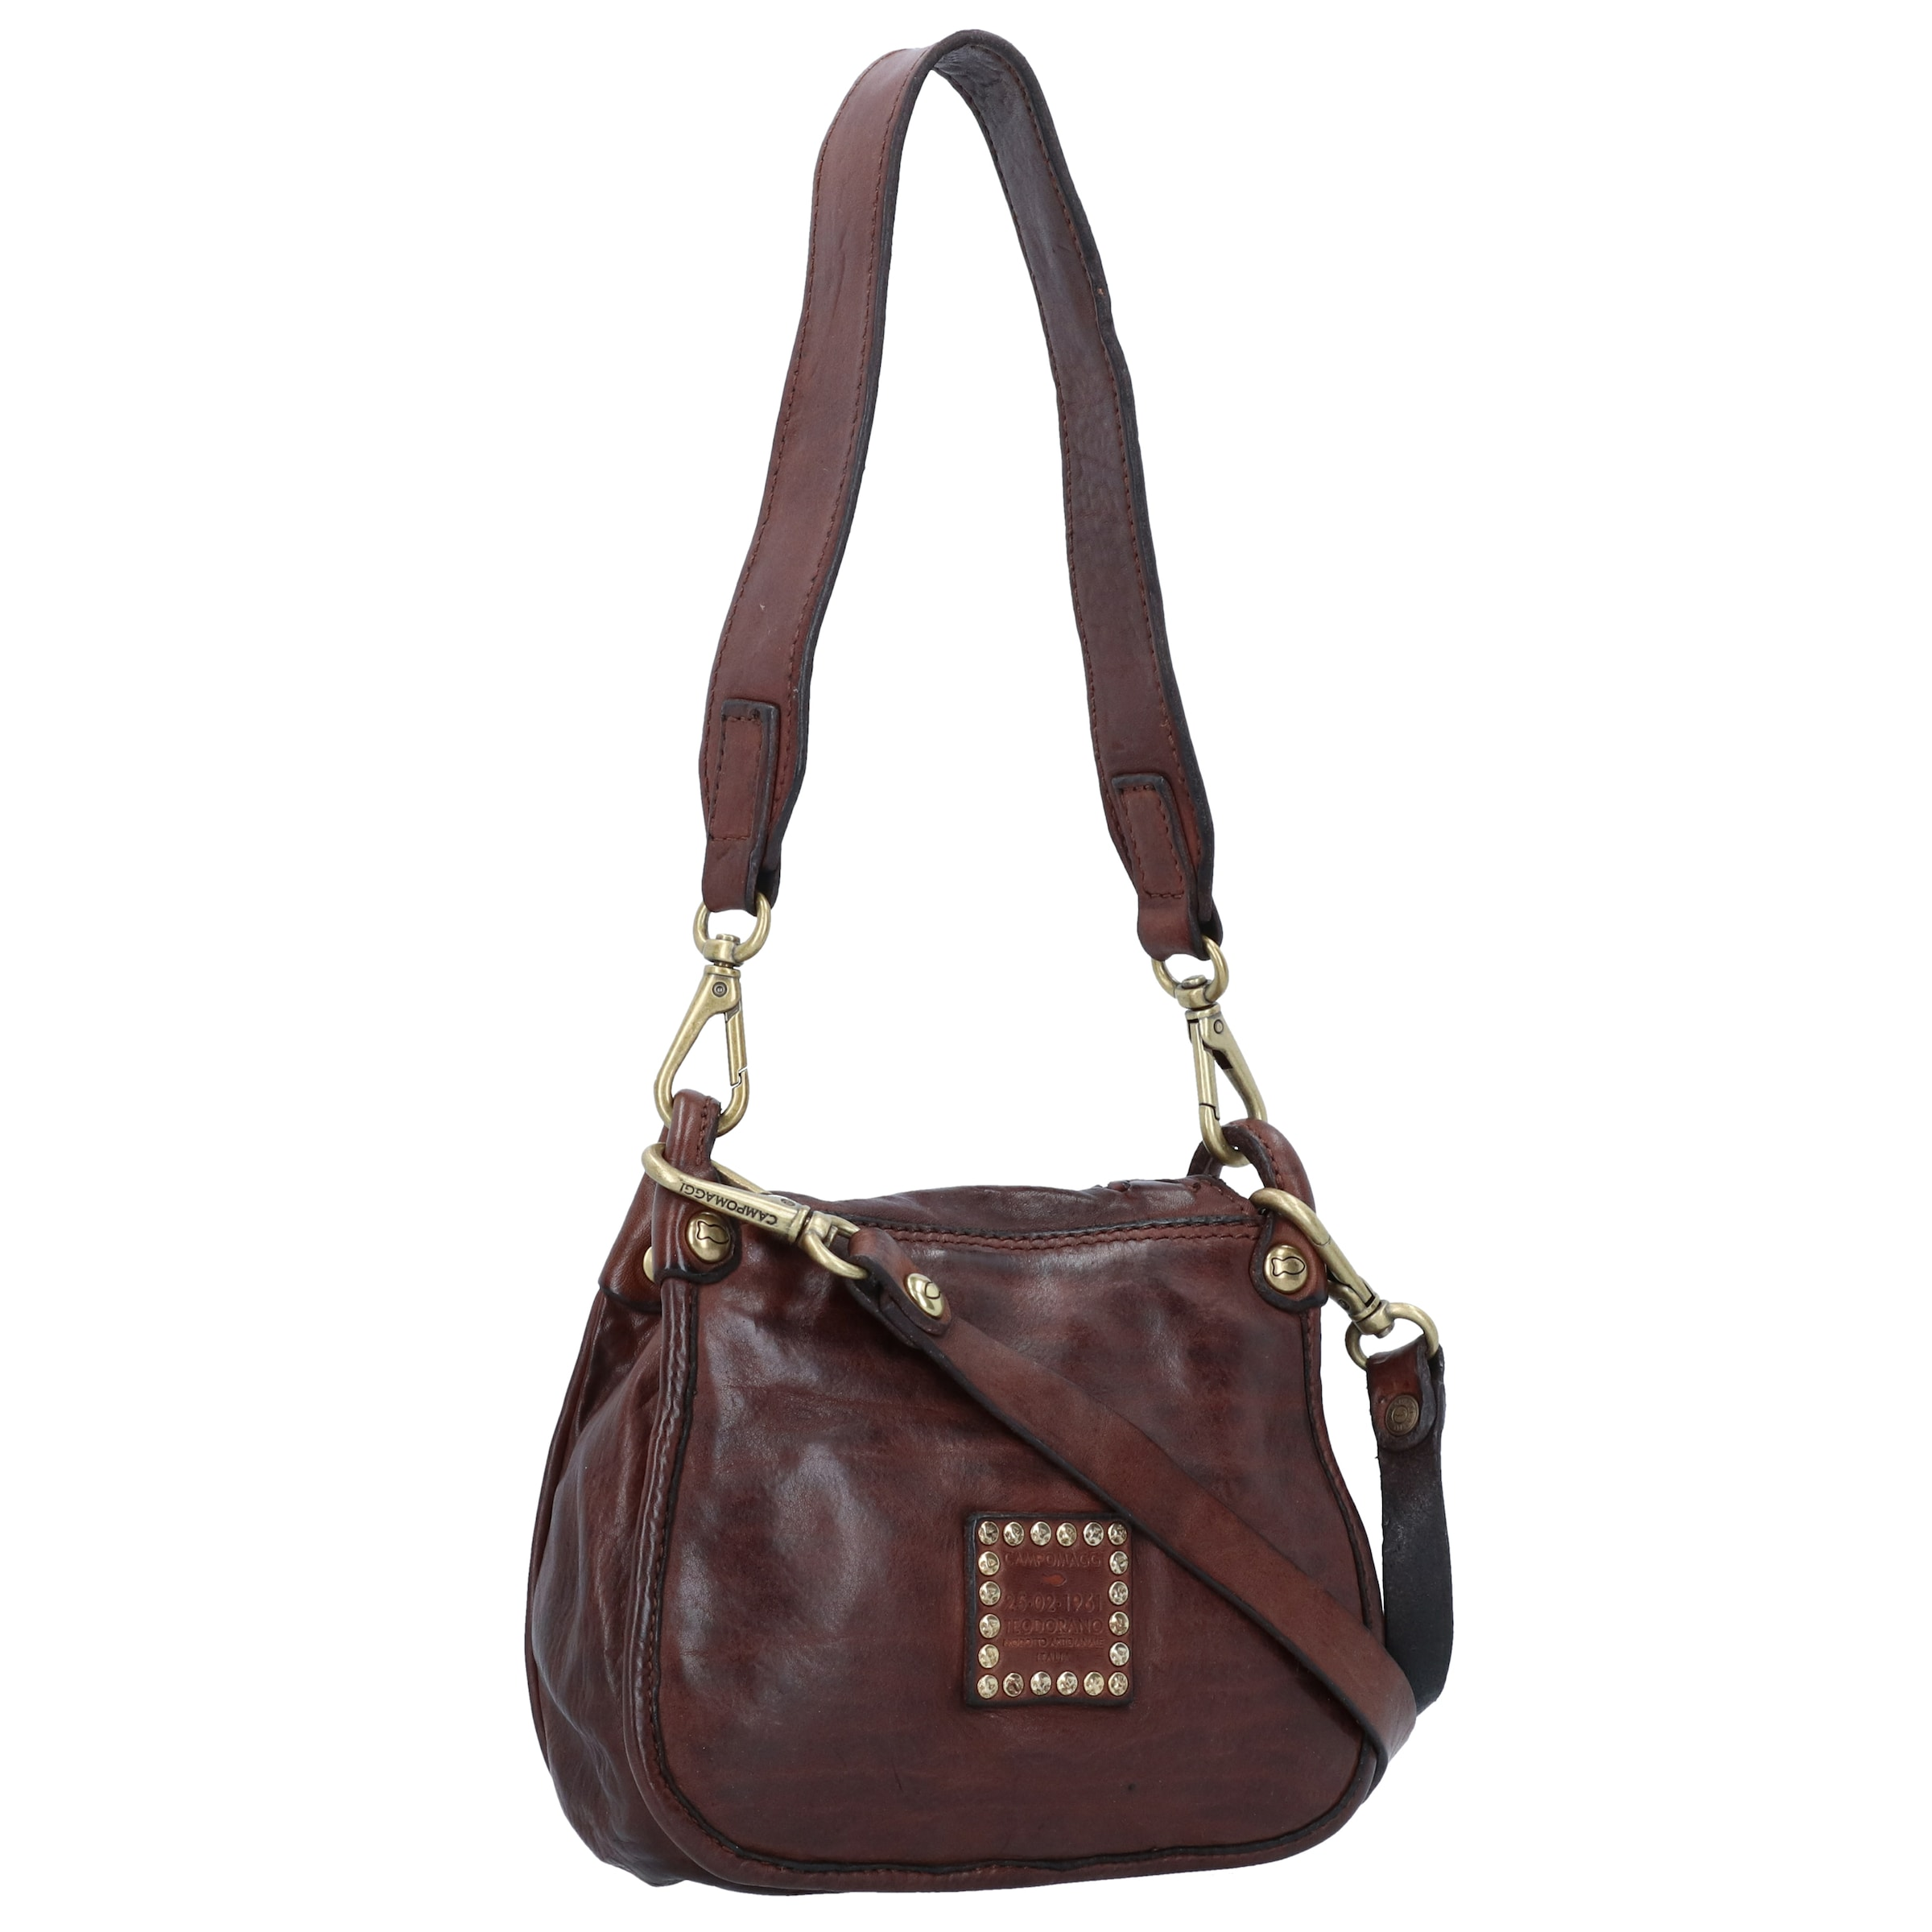 Handtasche Handtasche In Pueblo Campomaggi Campomaggi Pueblo Campomaggi In Yyvb7gf6